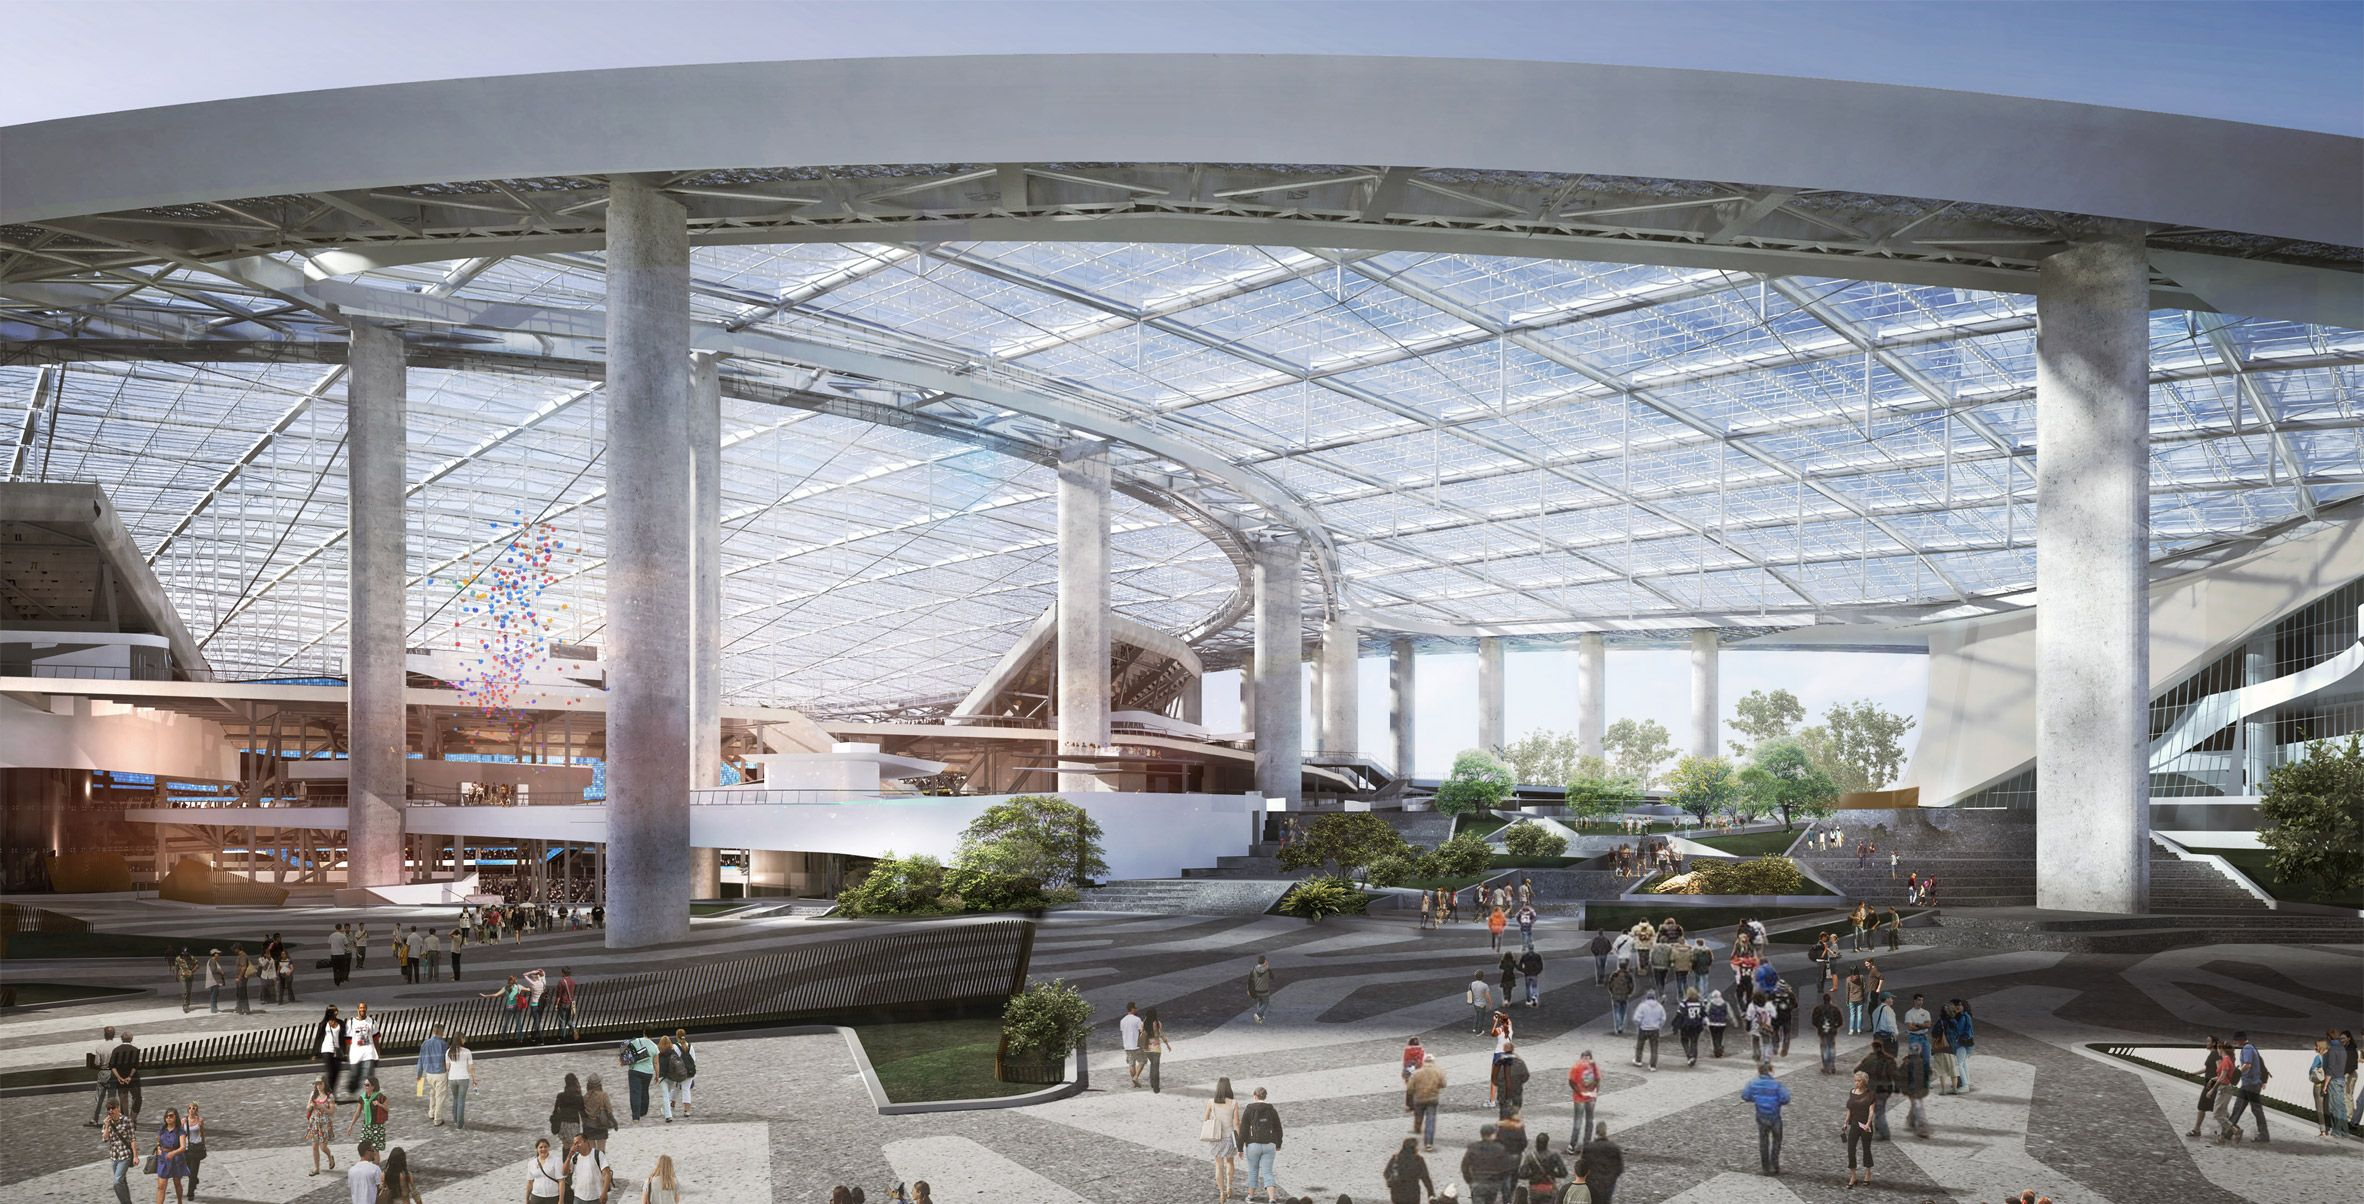 La Rams Stadium Hks Los Angeles Usa Architecture Dezeen 2364 Col 2 American Football Team La Rams Architecture